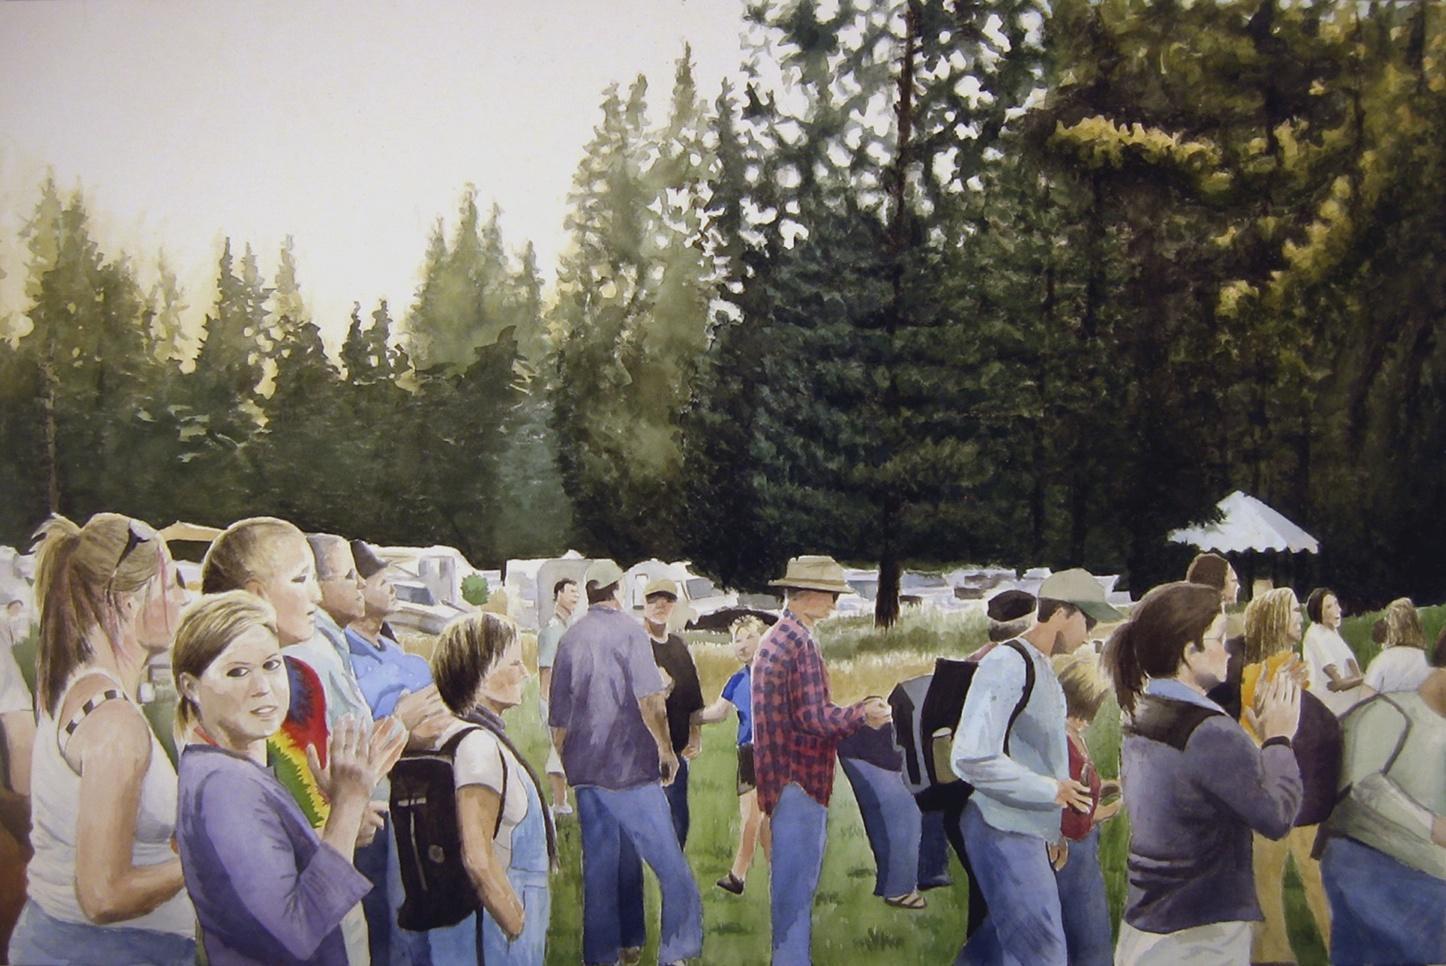 Festival Crowd, 2010, acrylic on canvas, 42 x 74 in.